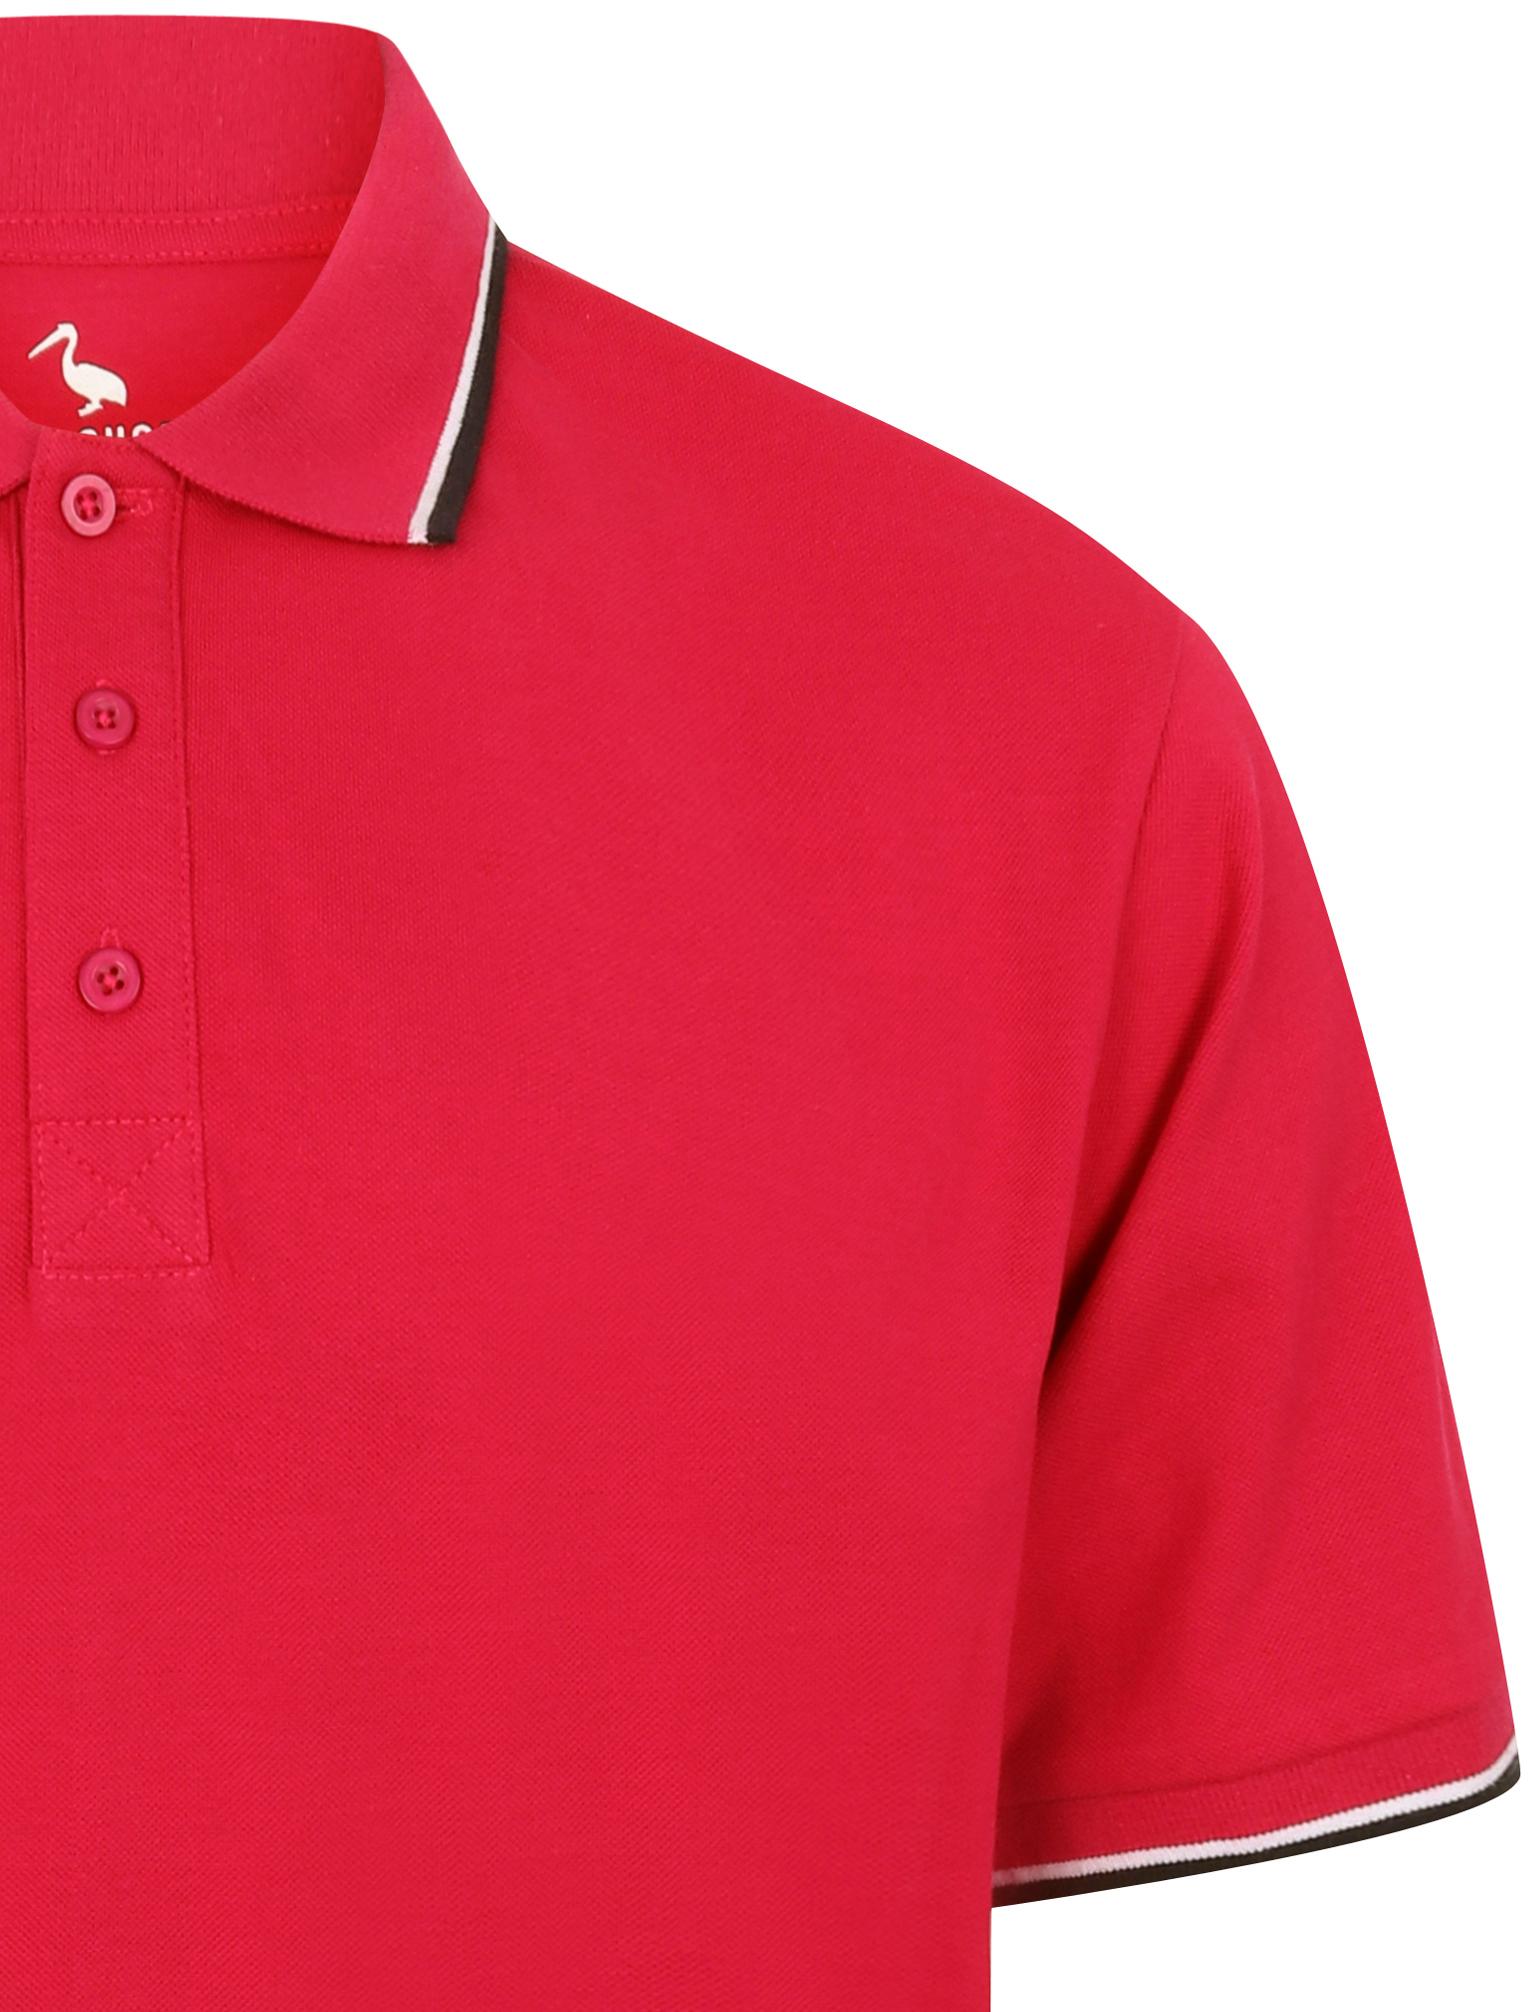 Sth-Shore-Mens-Plain-Polo-Shirt-100-Pique-Cotton-T-Shirt-Top-Collar-Size-M-XXL thumbnail 37